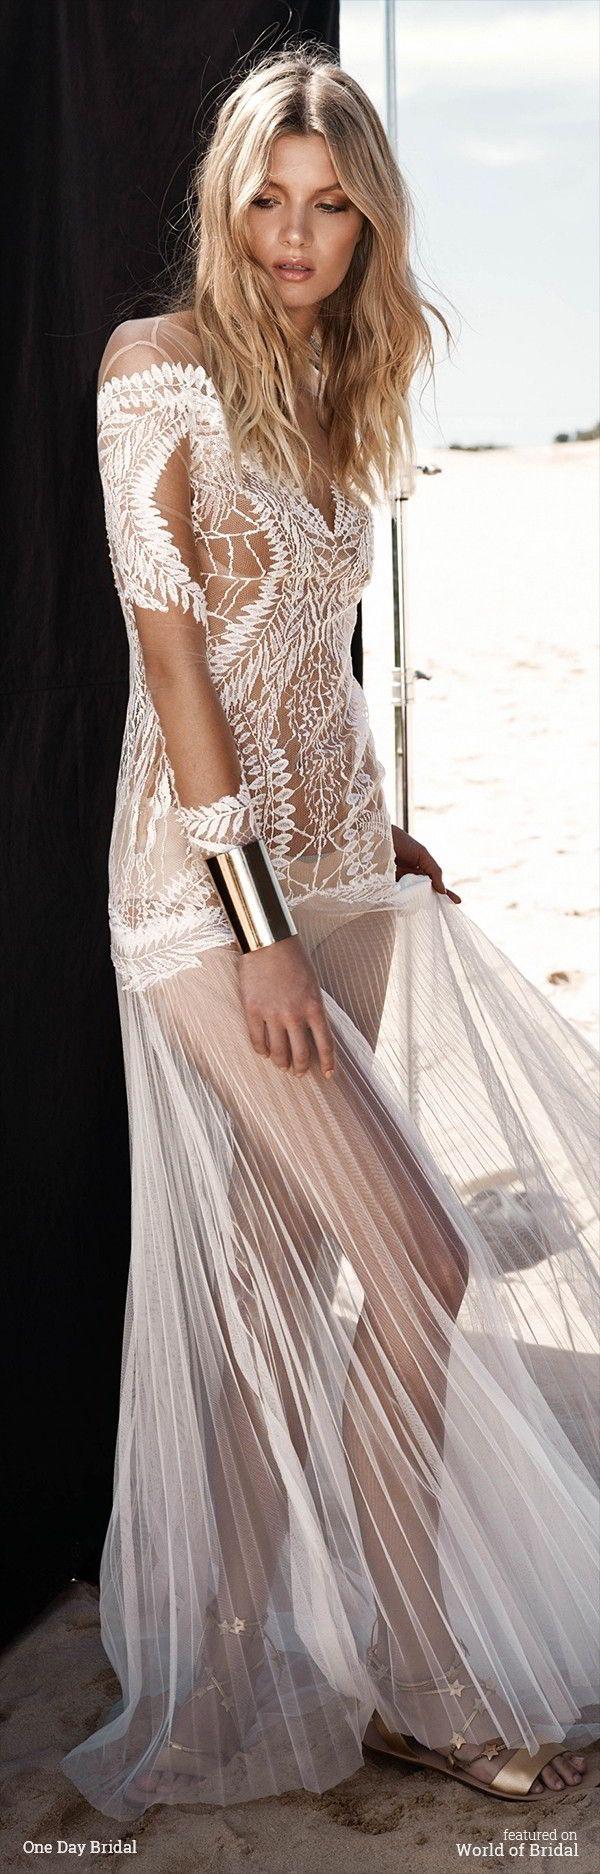 s wedding dresses 60's wedding dress 25 Best Ideas about s Wedding Dresses on Pinterest s style wedding dresses s wedding and Wedding gown box